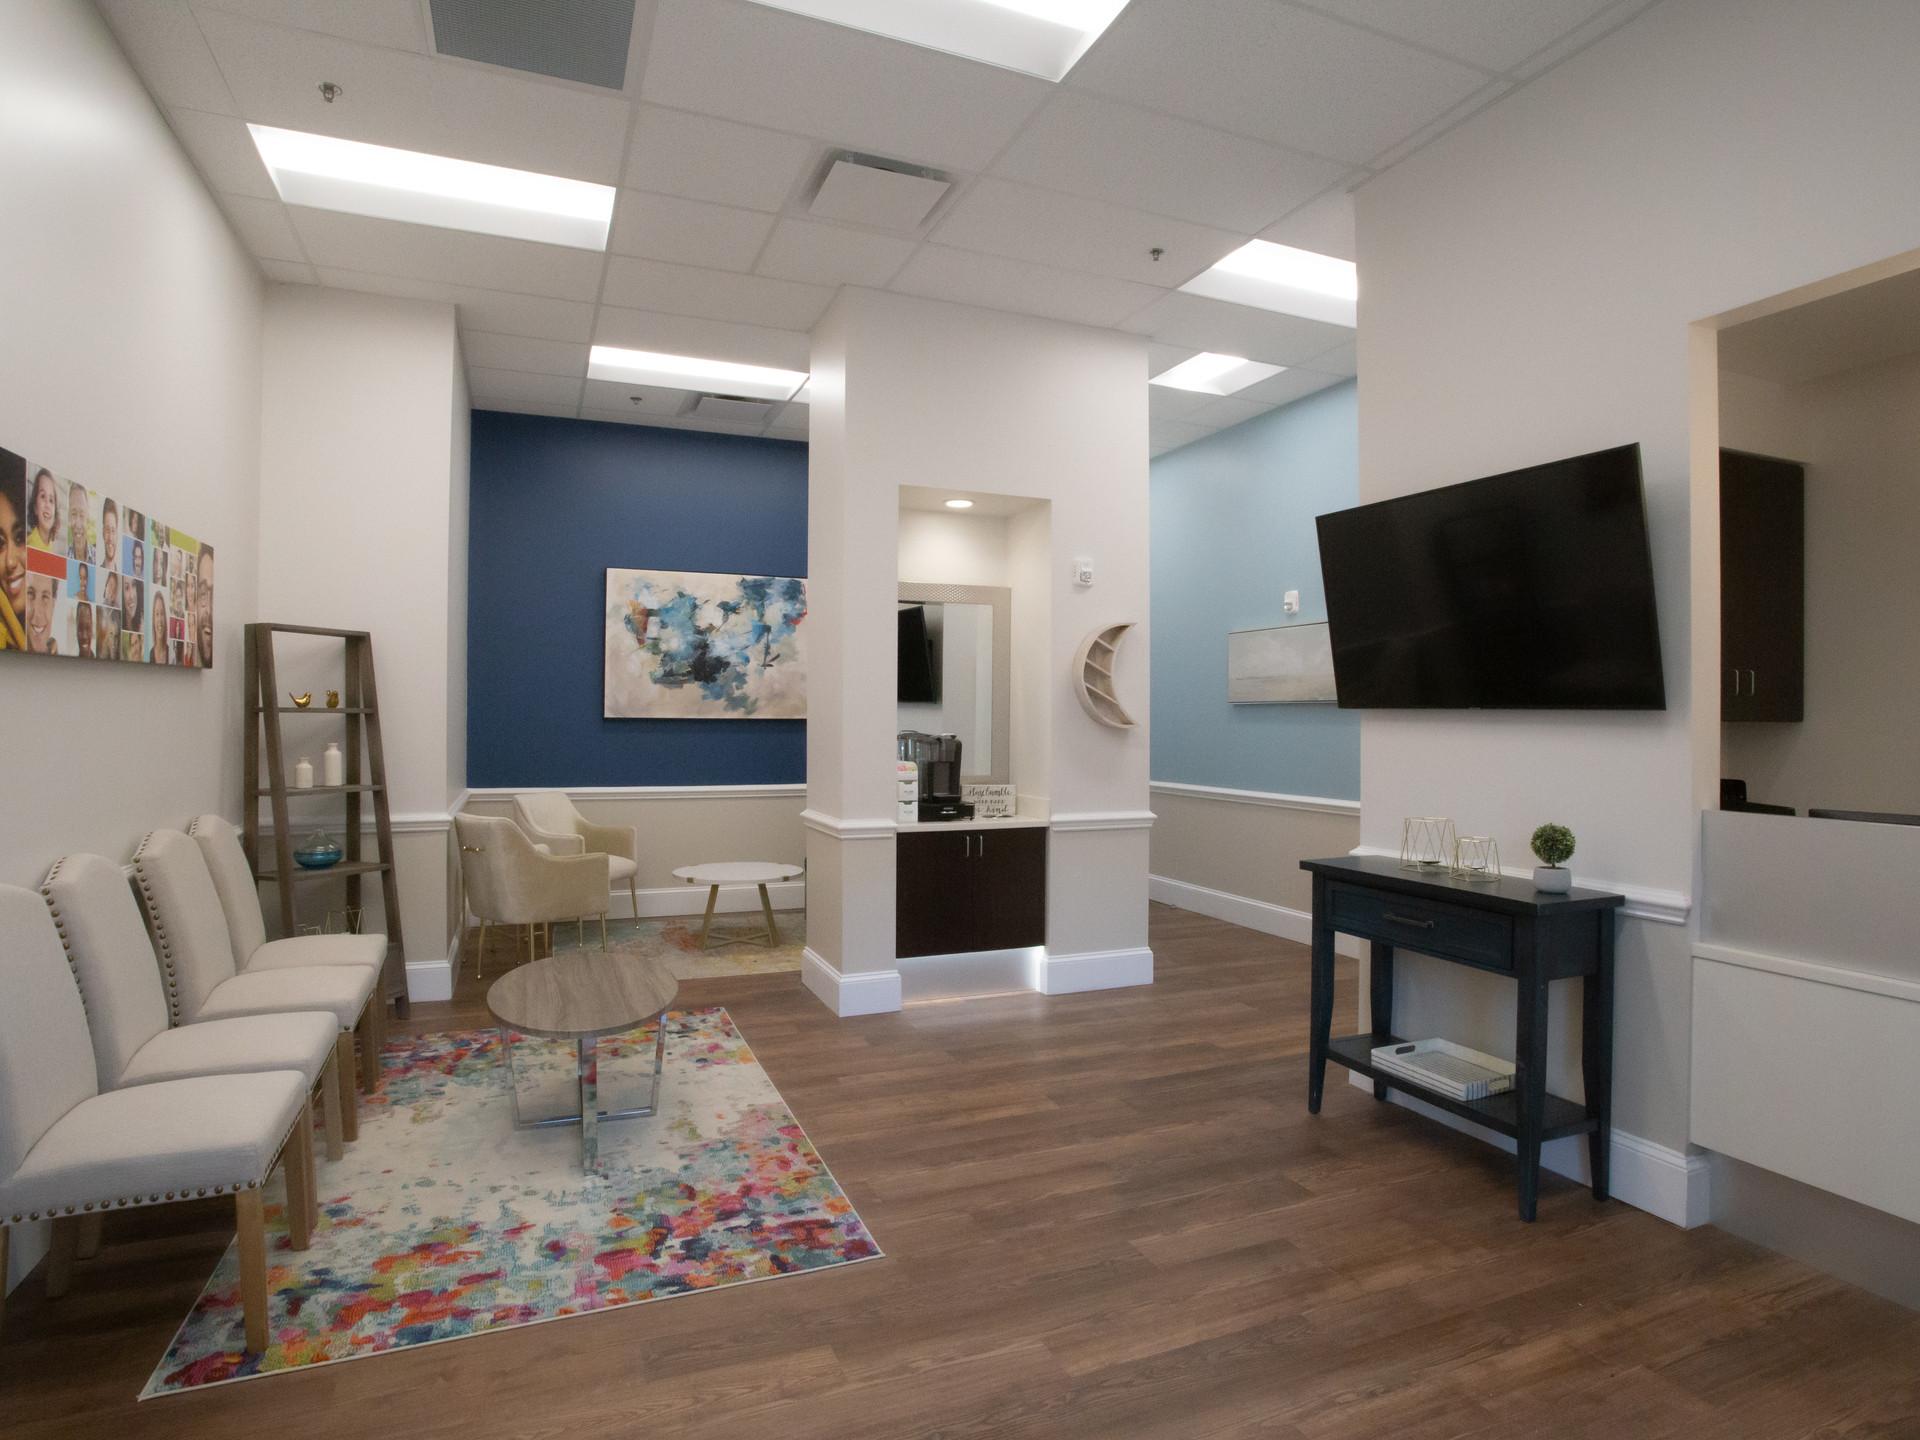 Madison Yards Family Dentistry